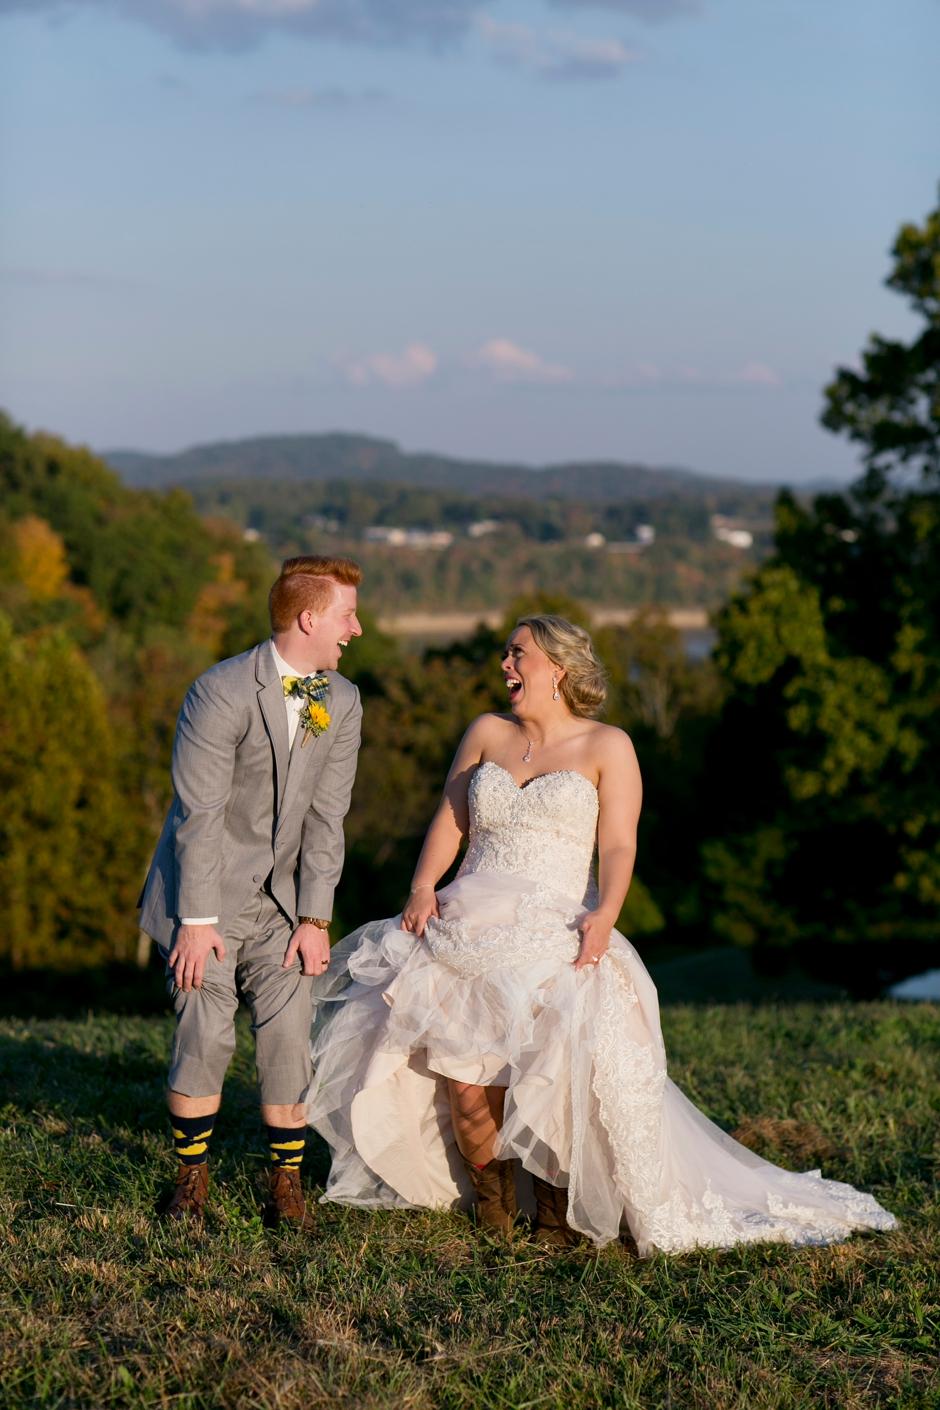 somorset-kentucky-fall-wedding-085.JPG